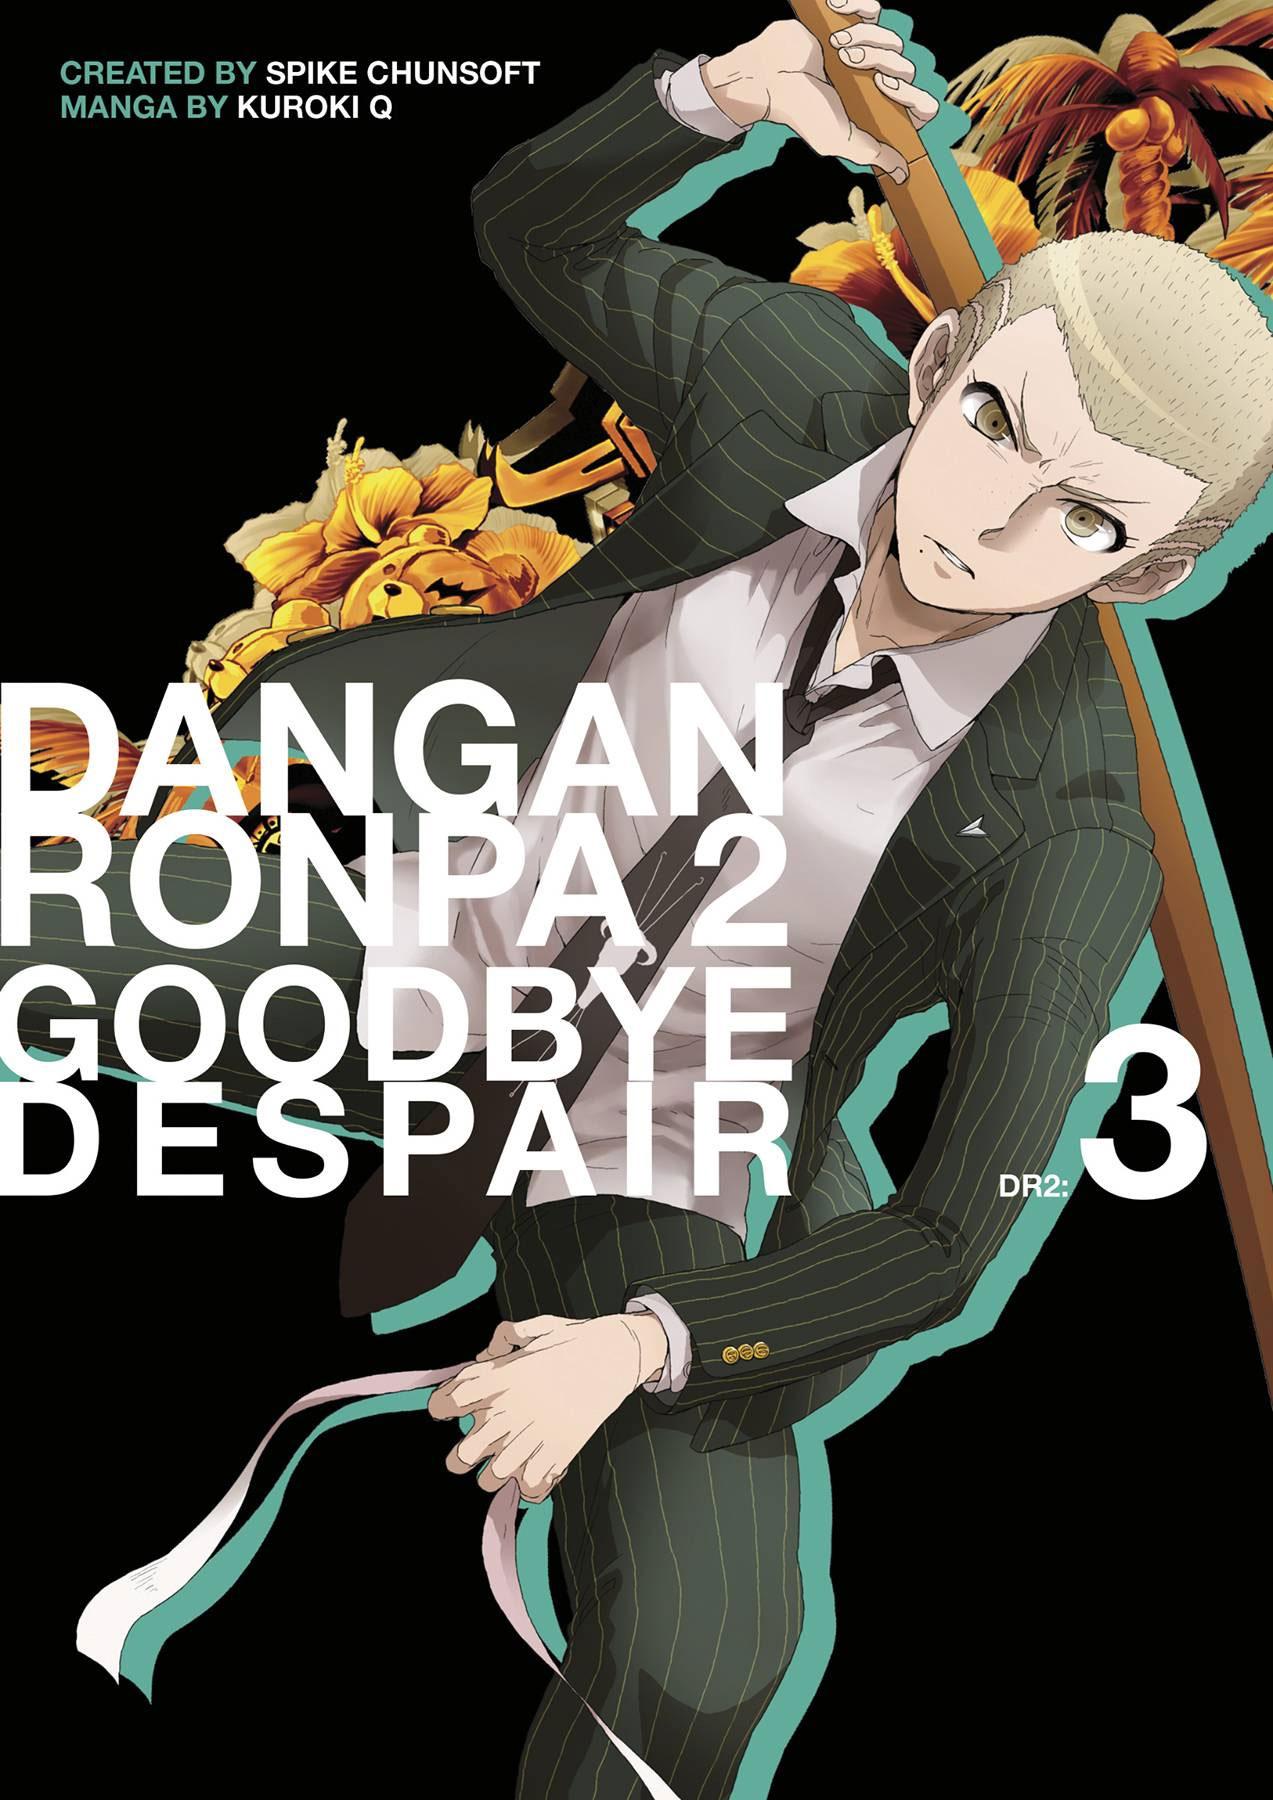 Danganronpa 2: Goodbye Despair : danganronpa, goodbye, despair, TPB-Manga, Danganronpa, Goodbye, Despair, Manga, Archonia.com